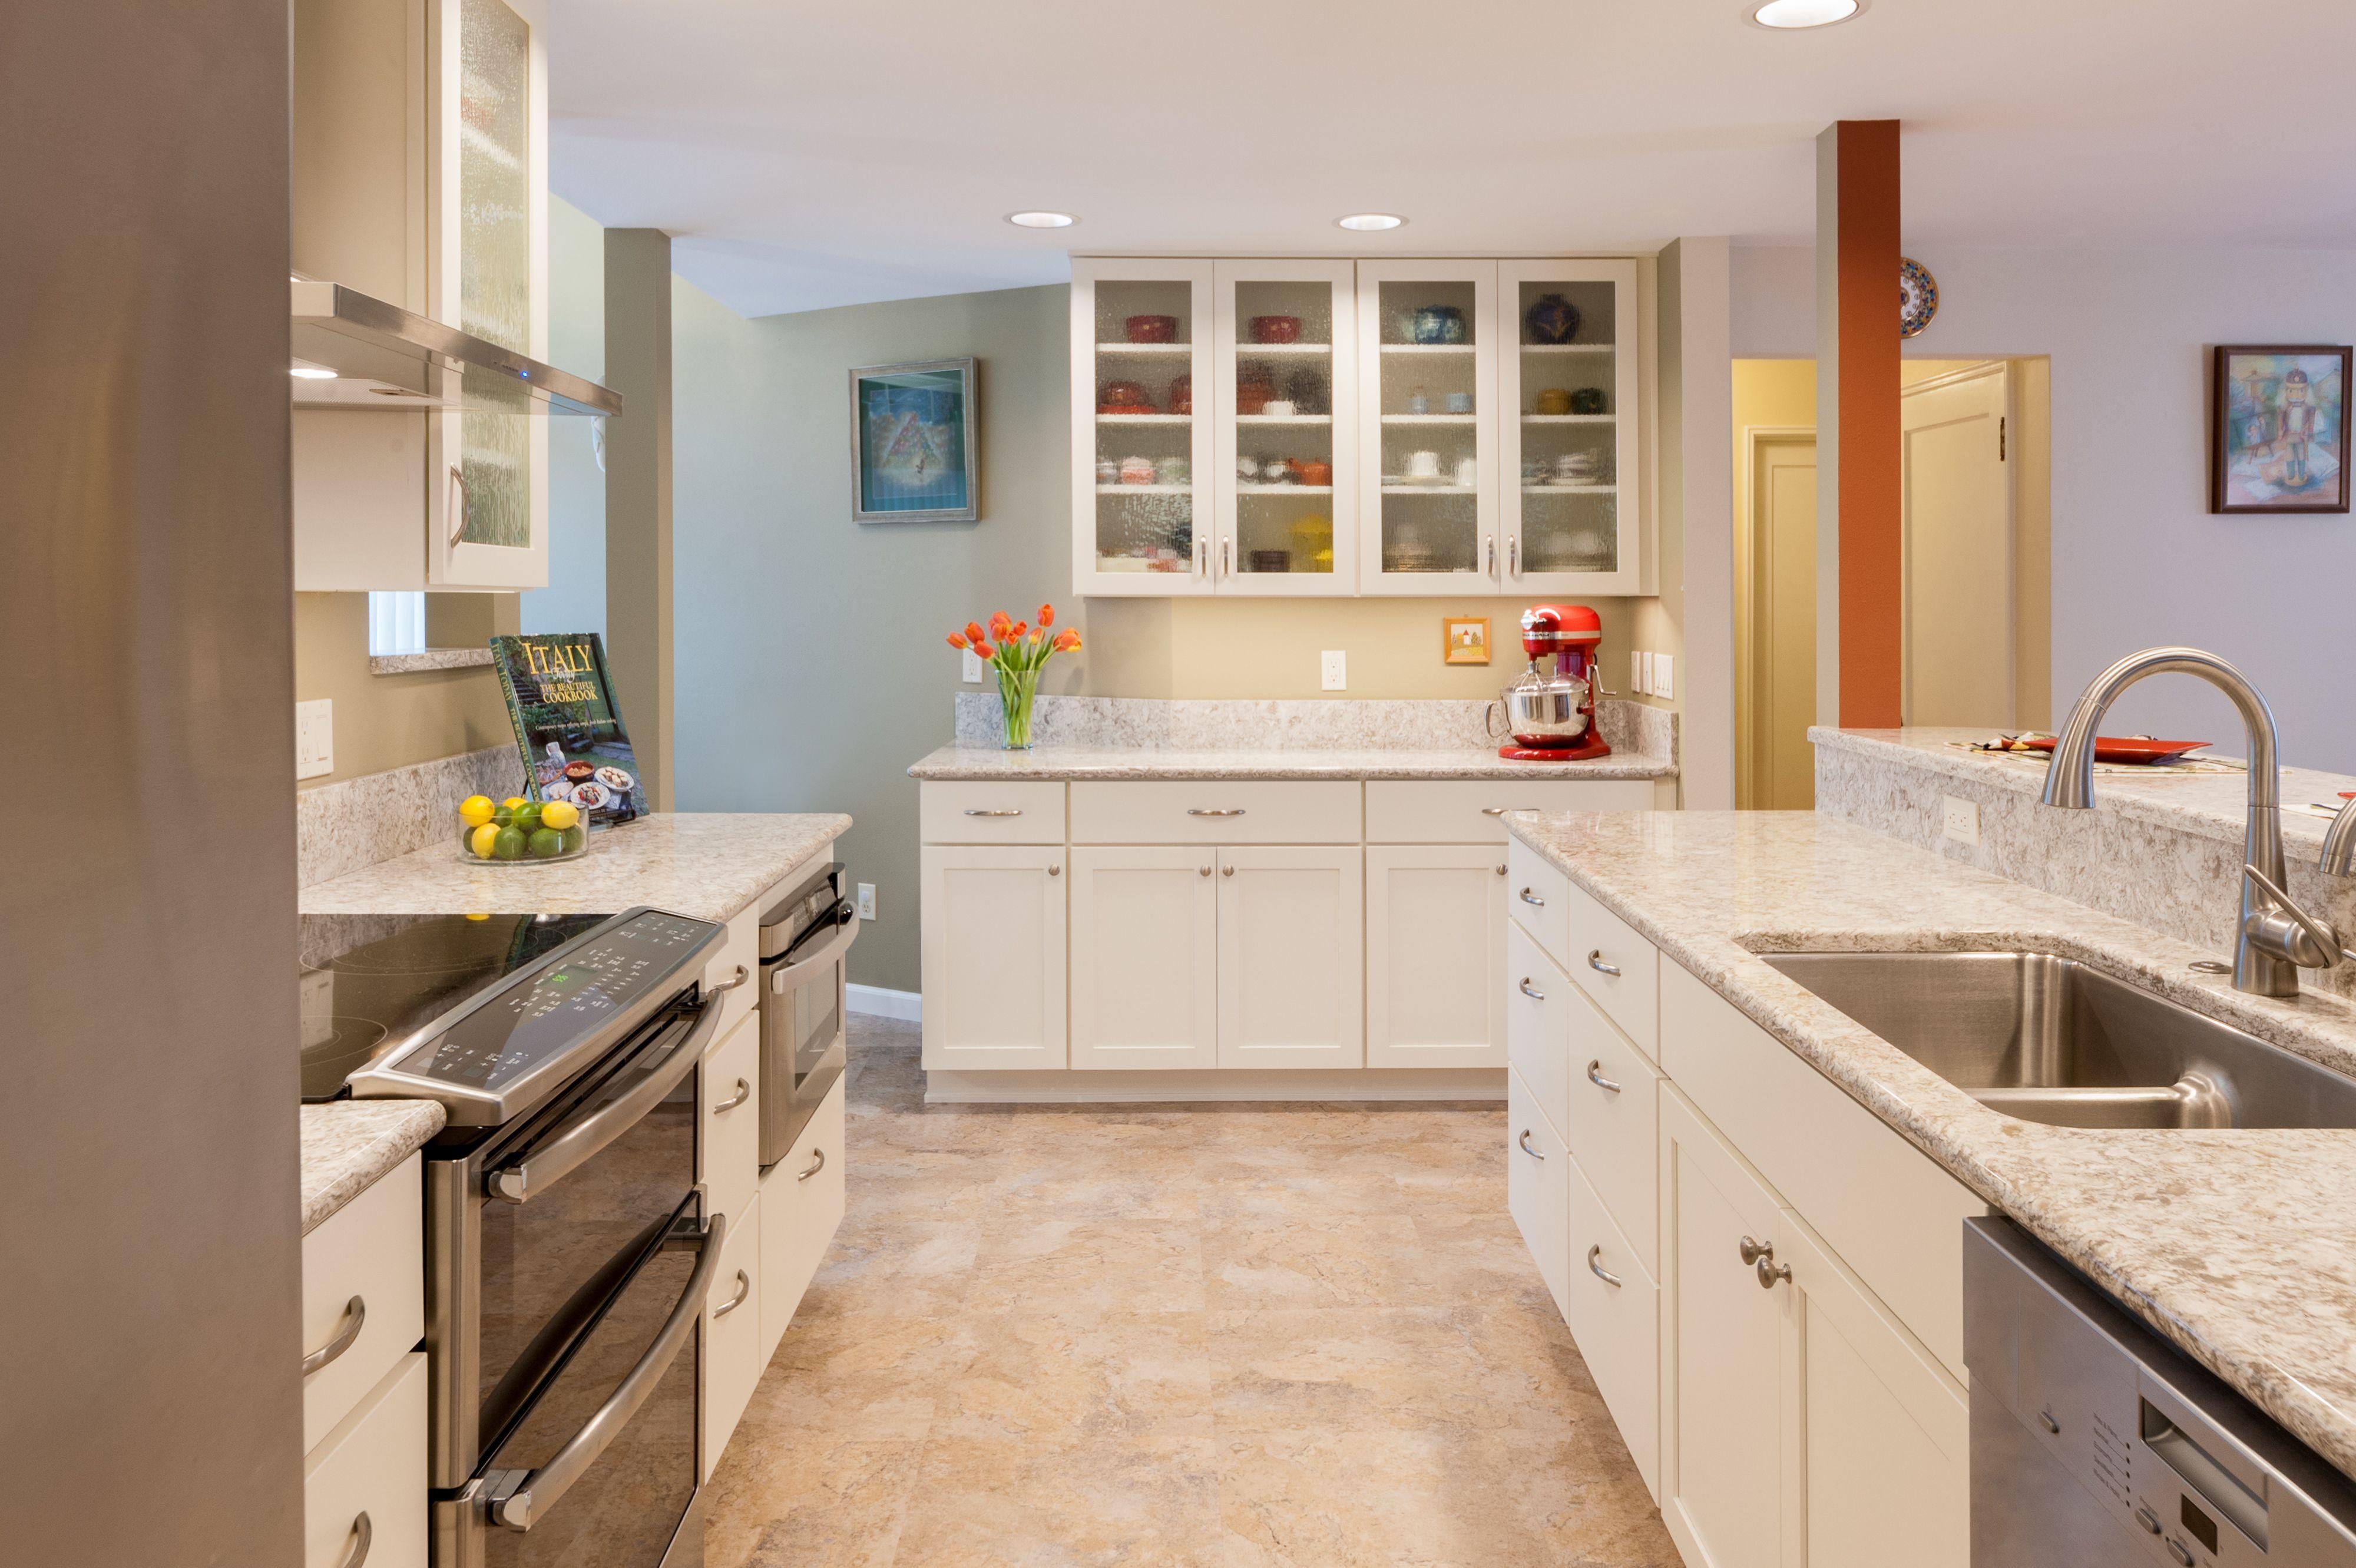 open galley kitchens | Bright Open Galley Kitchen - McAdams Remodeling #opengalleykitchen open galley kitchens | Bright Open Galley Kitchen - McAdams Remodeling #opengalleykitchen